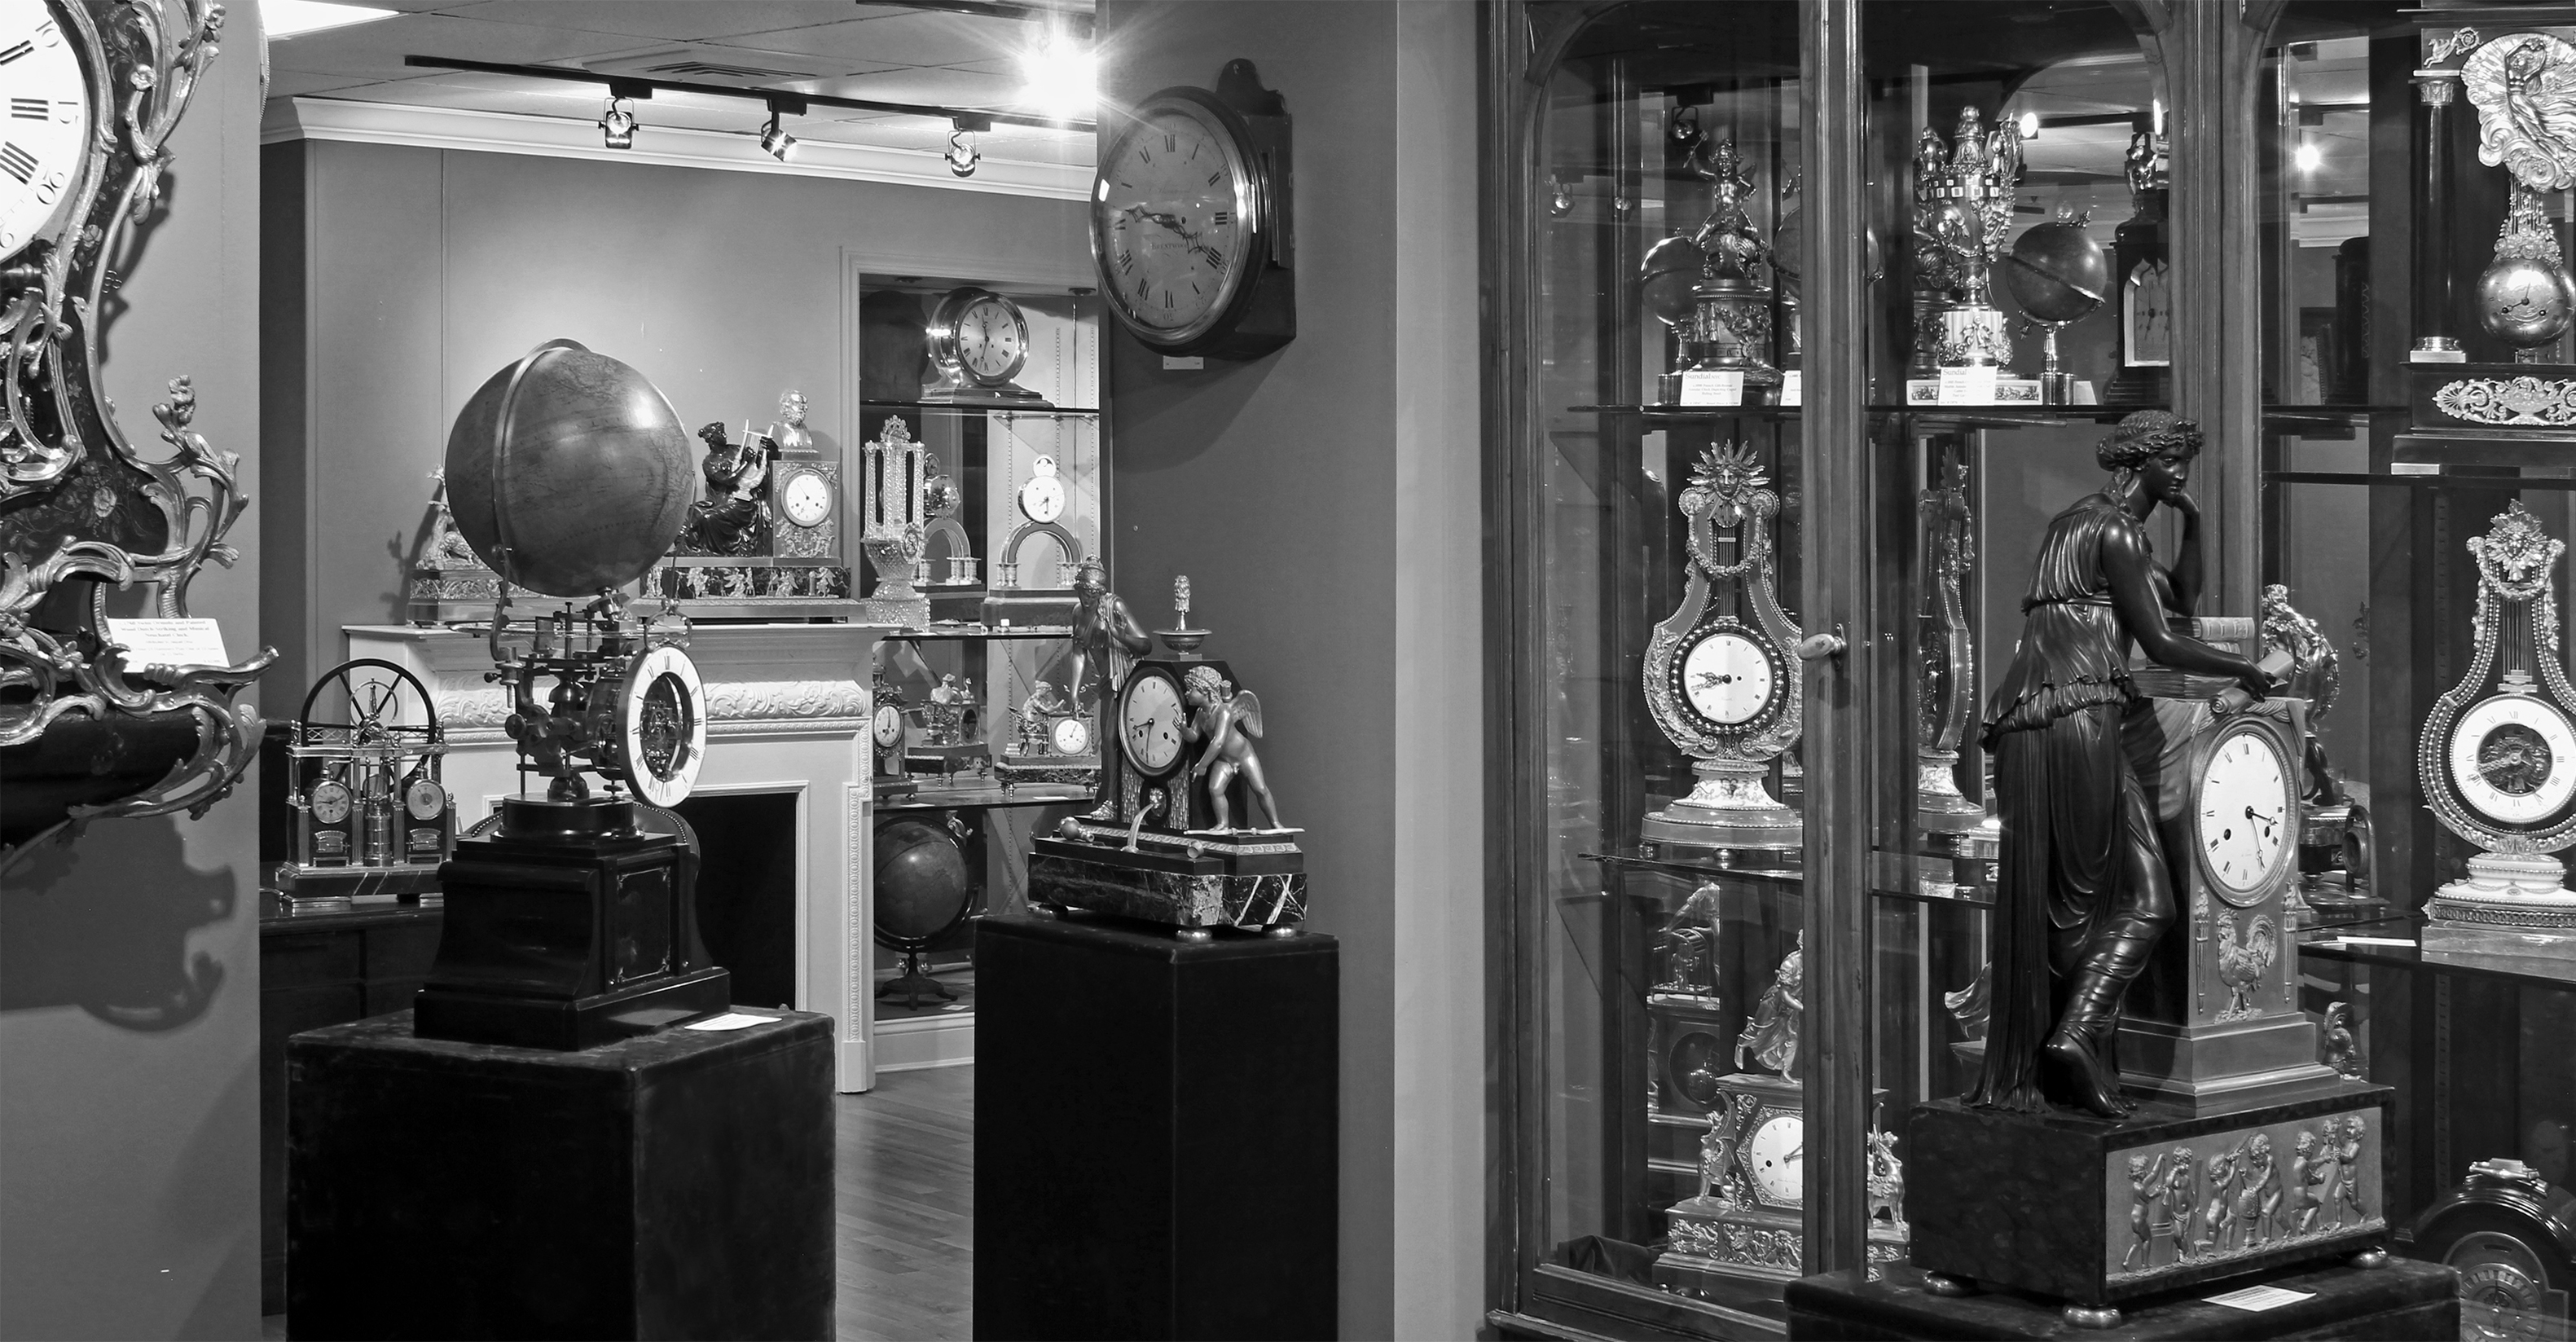 sundialfarm-investing-in-clocks-image